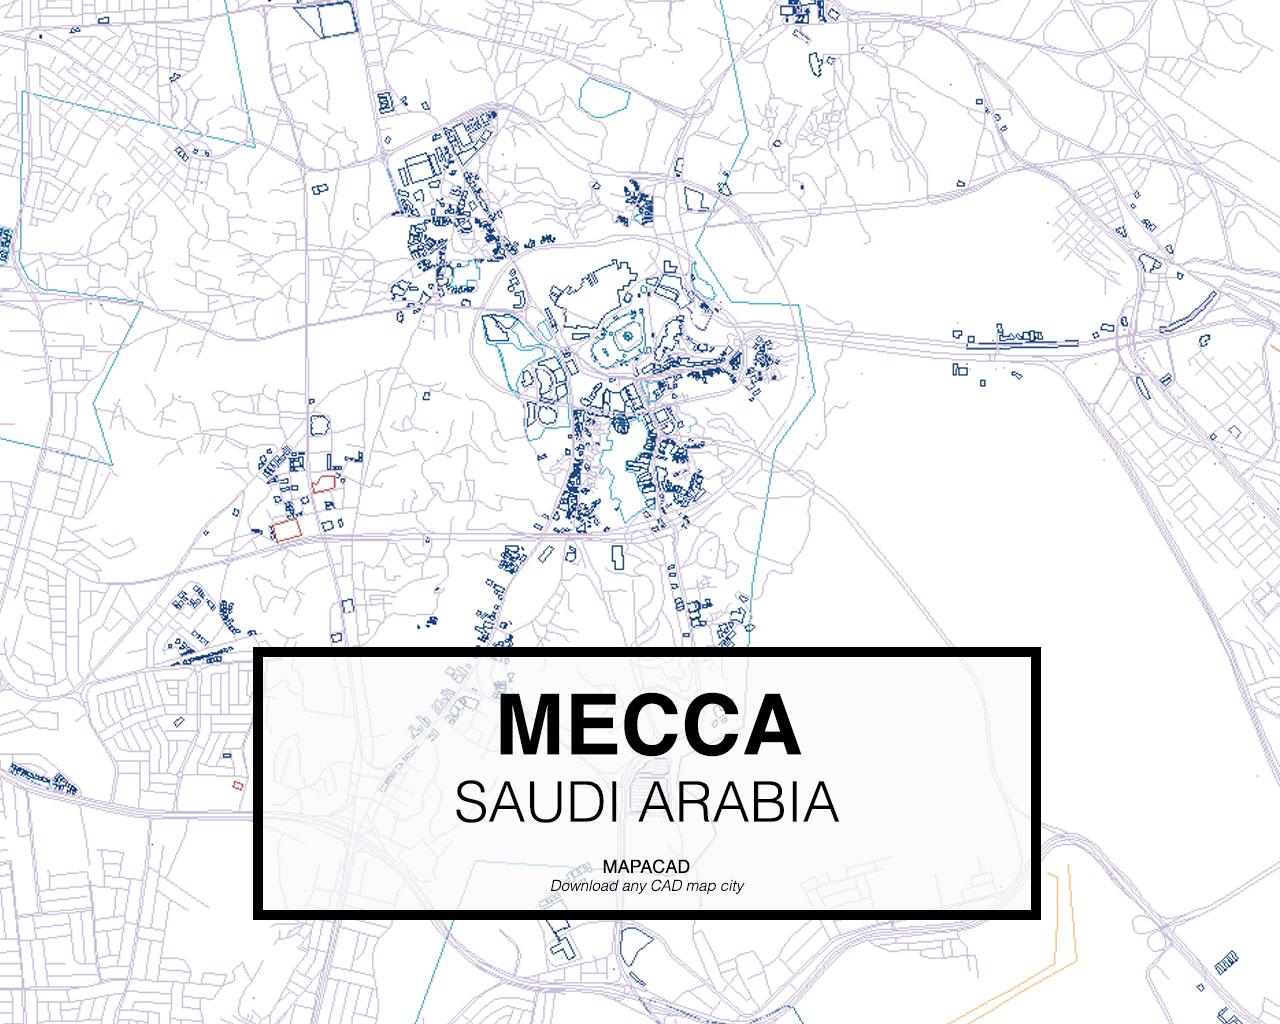 Download Mecca DWG - Mapacad